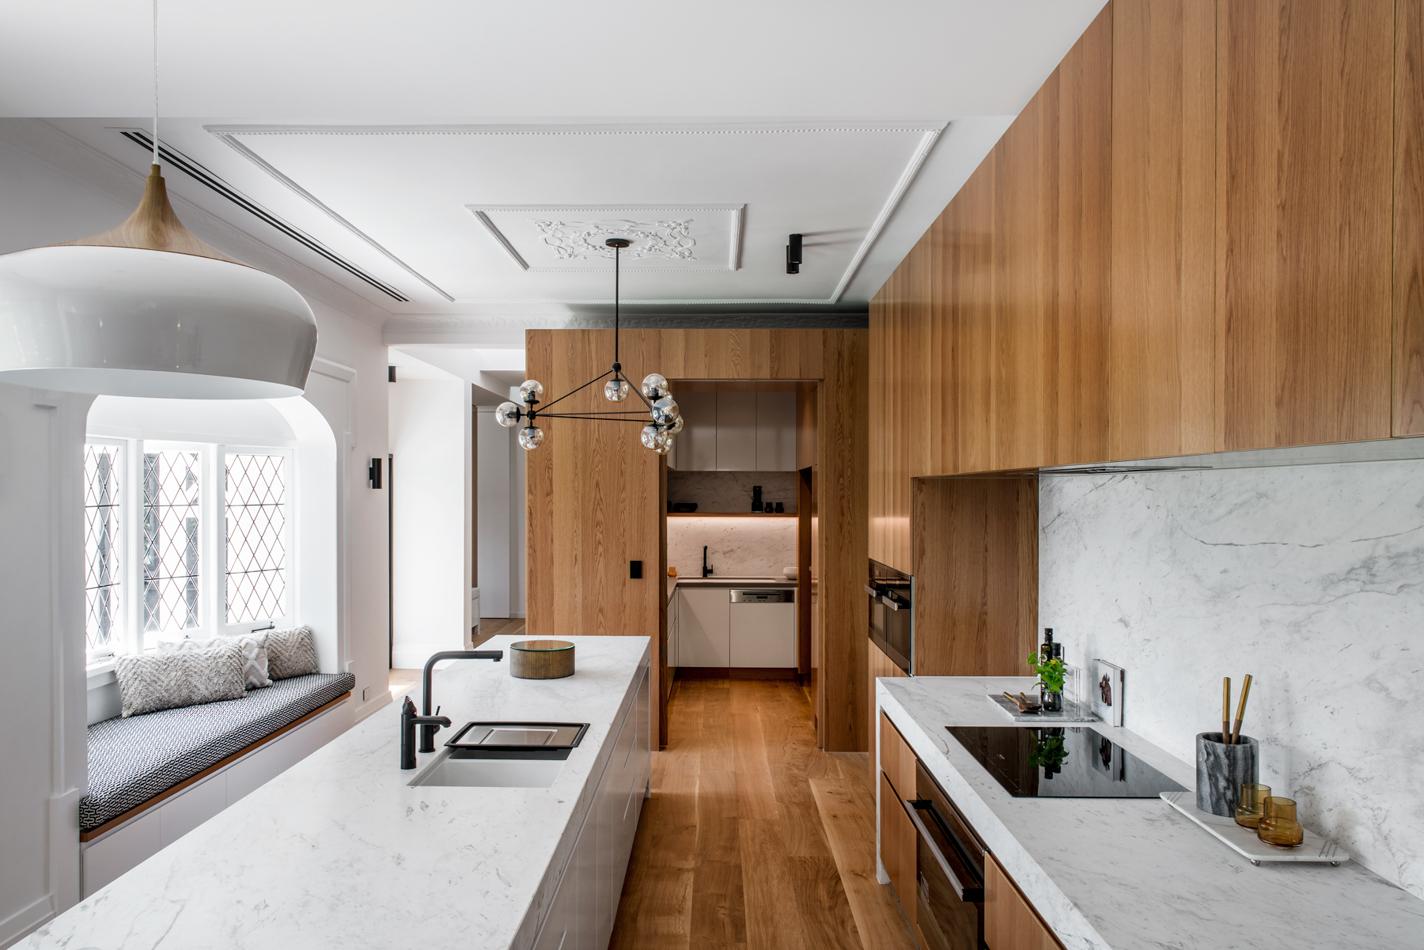 the-terrace-shaun-lockyer-architects-the-design-emotive-17.jpg